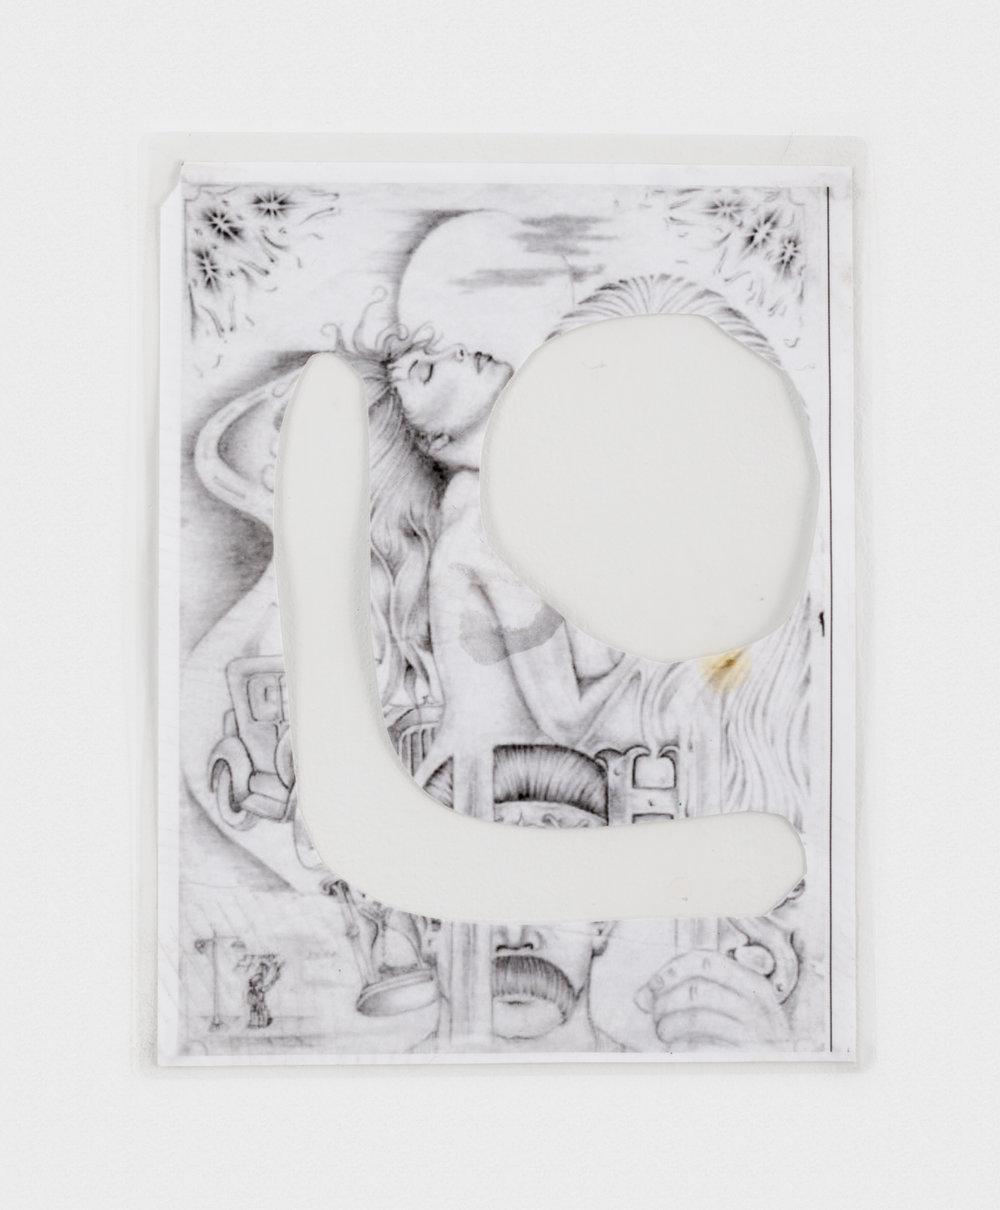 Alex Becerra Love is Negative 2016 Ink transfer on paper (laminated) 11 x 8 1/2 in (27.94h x 21.59w cm) AB208